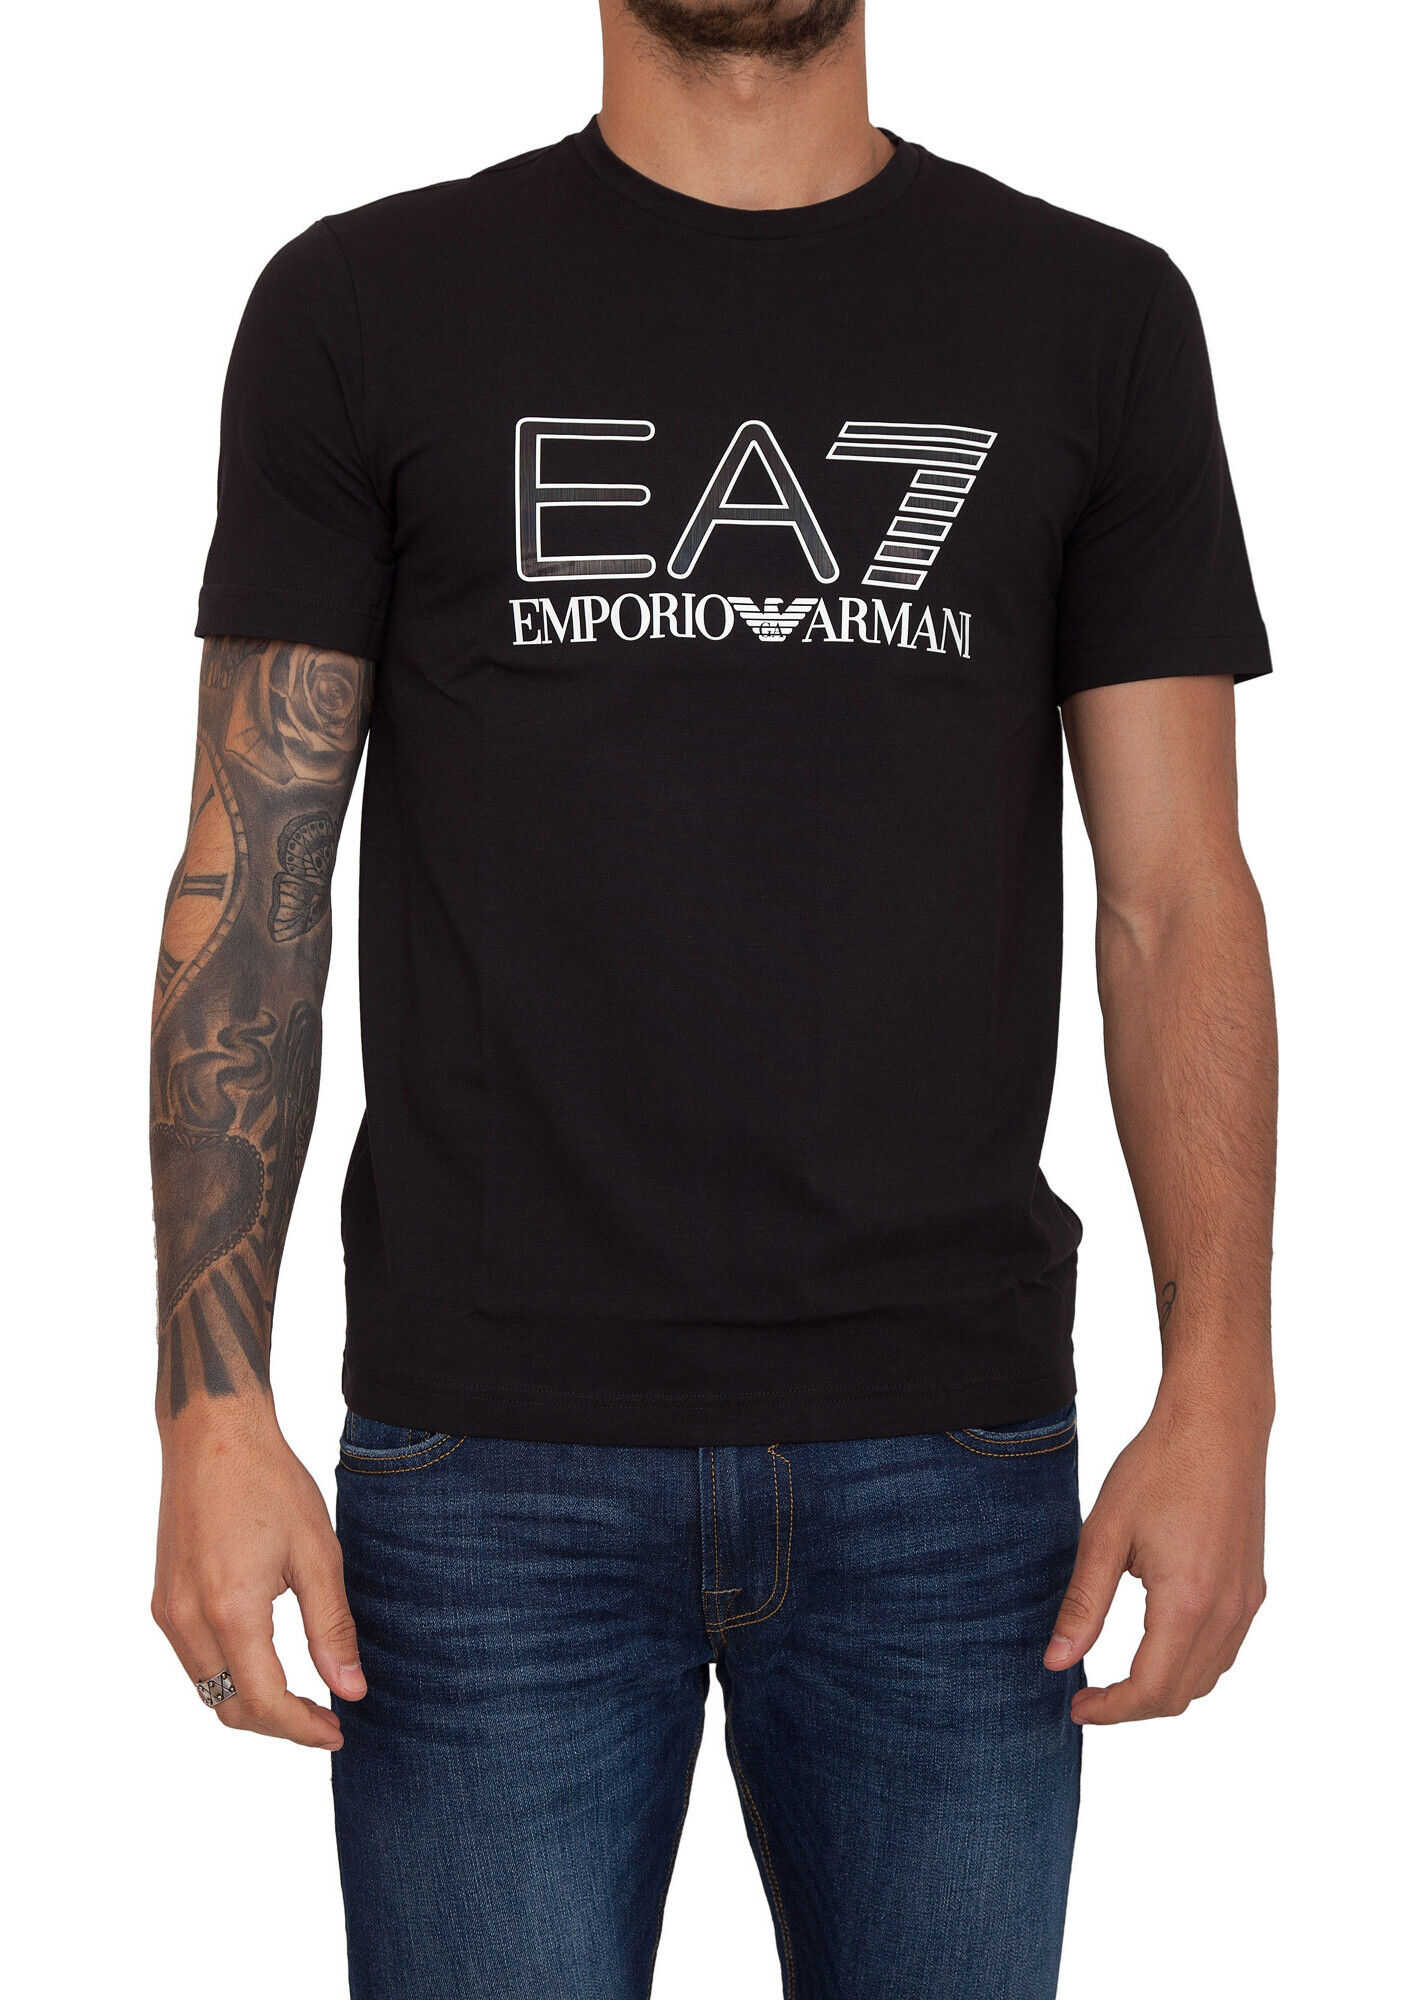 EA7 E0EB0301 BLACK